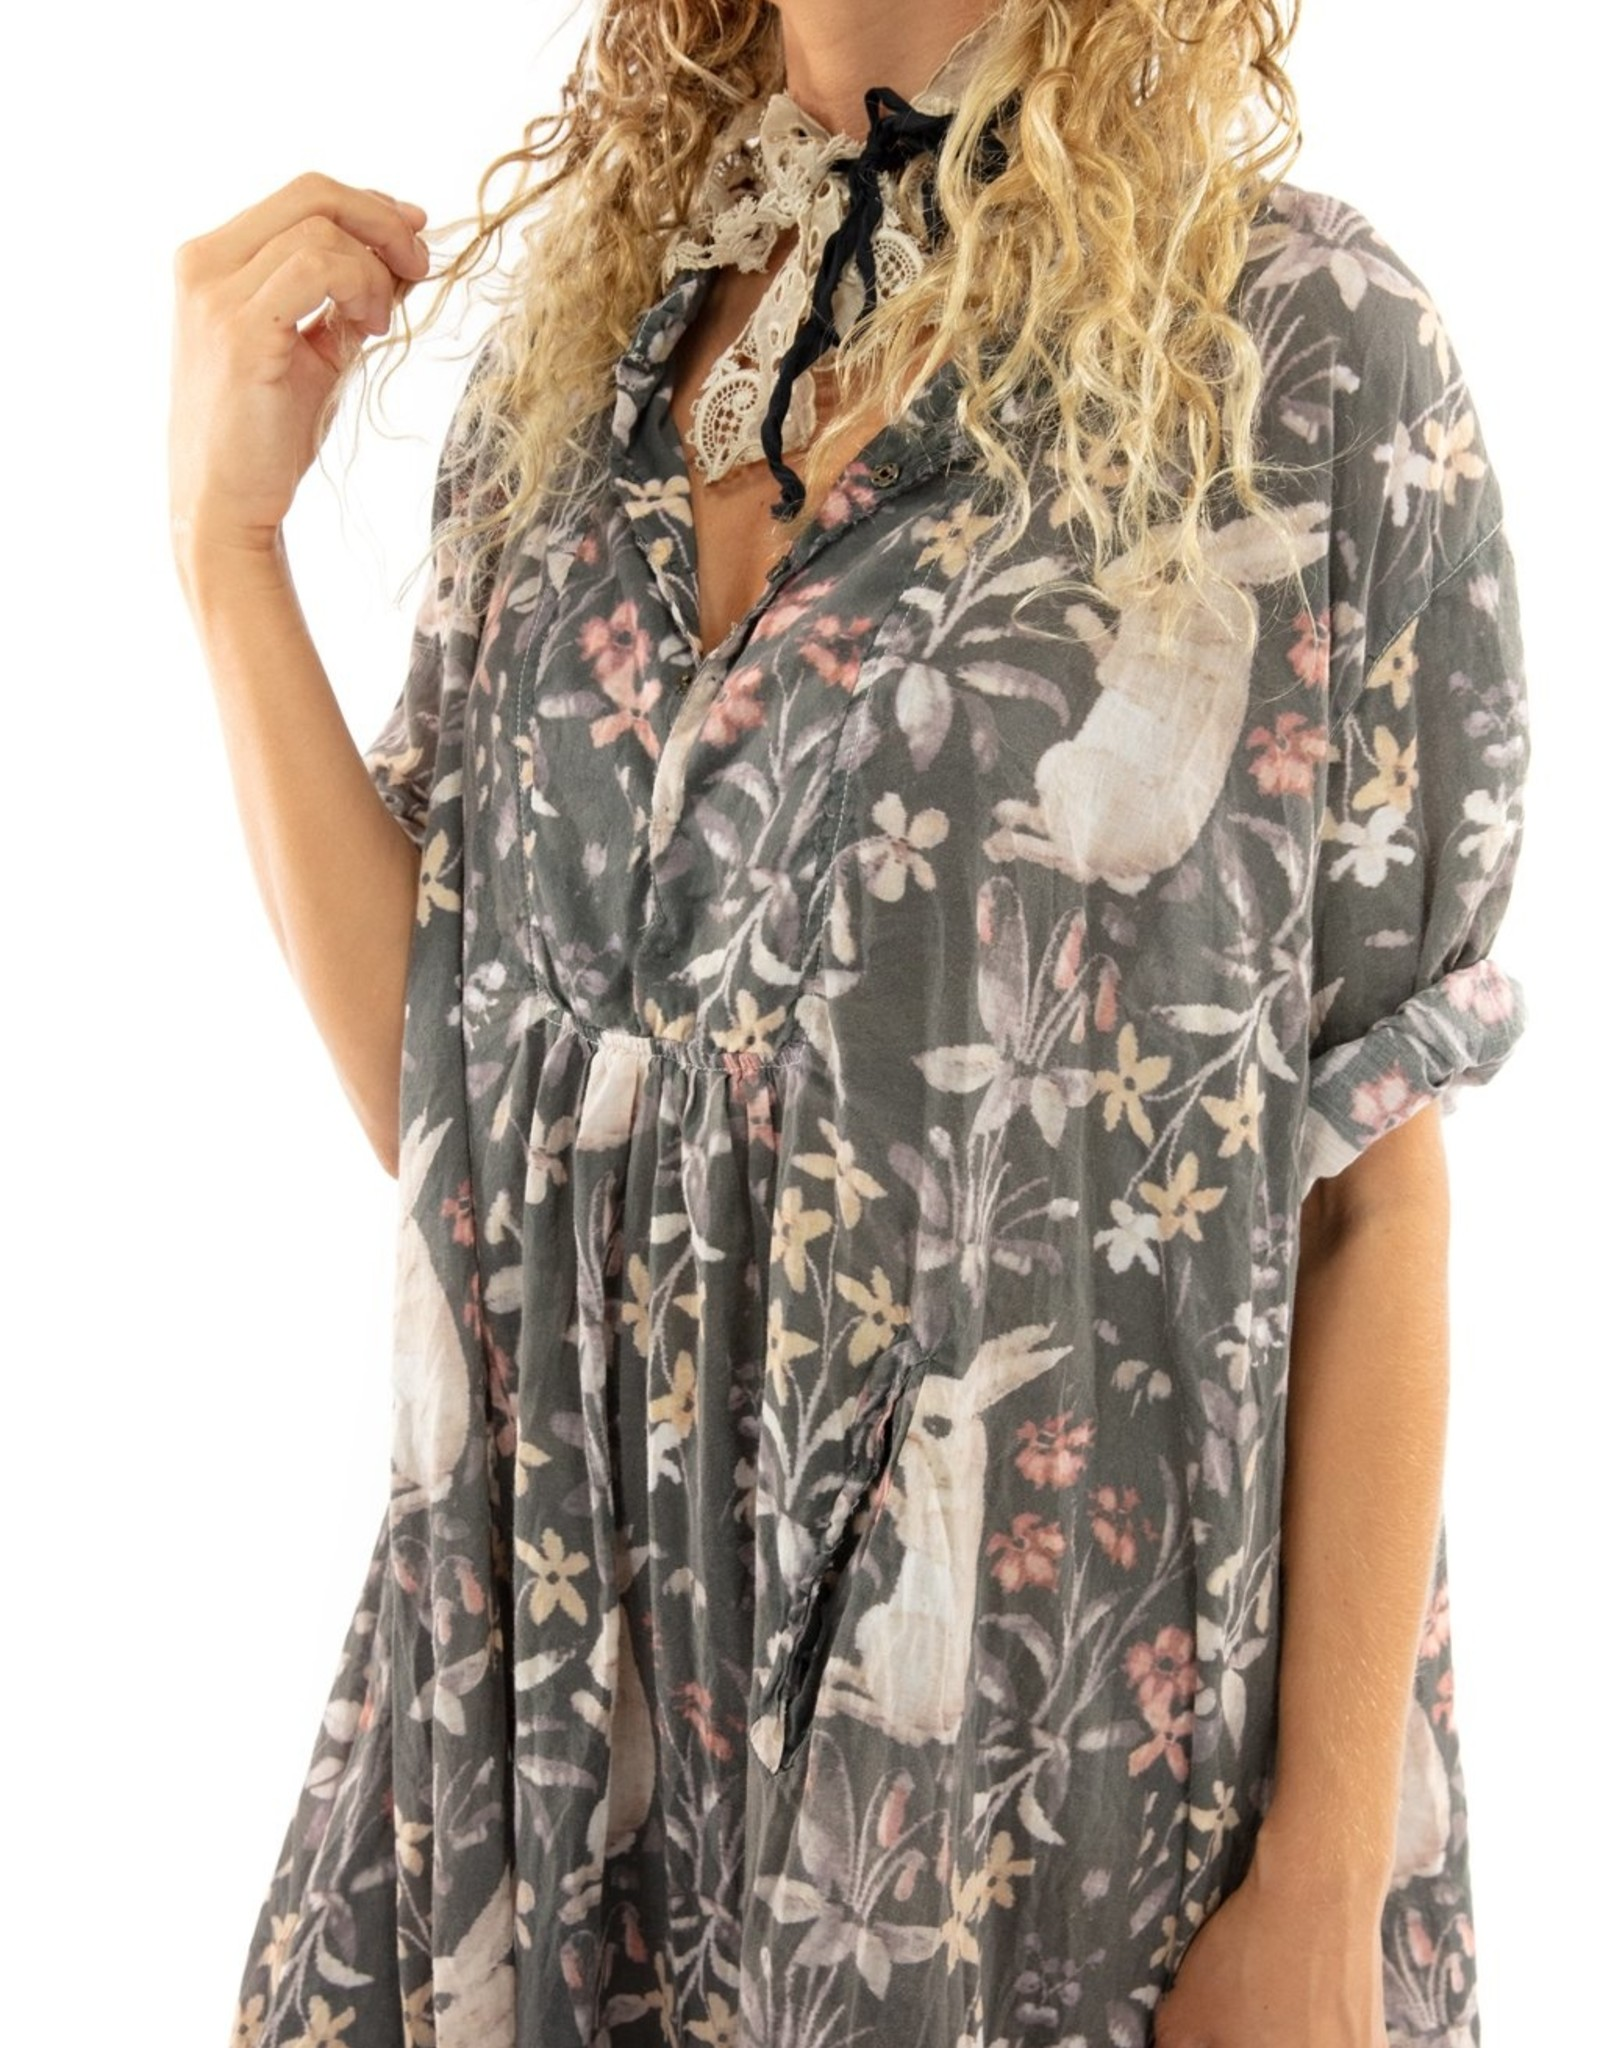 MAGNOLIA PEARL Silke Dress